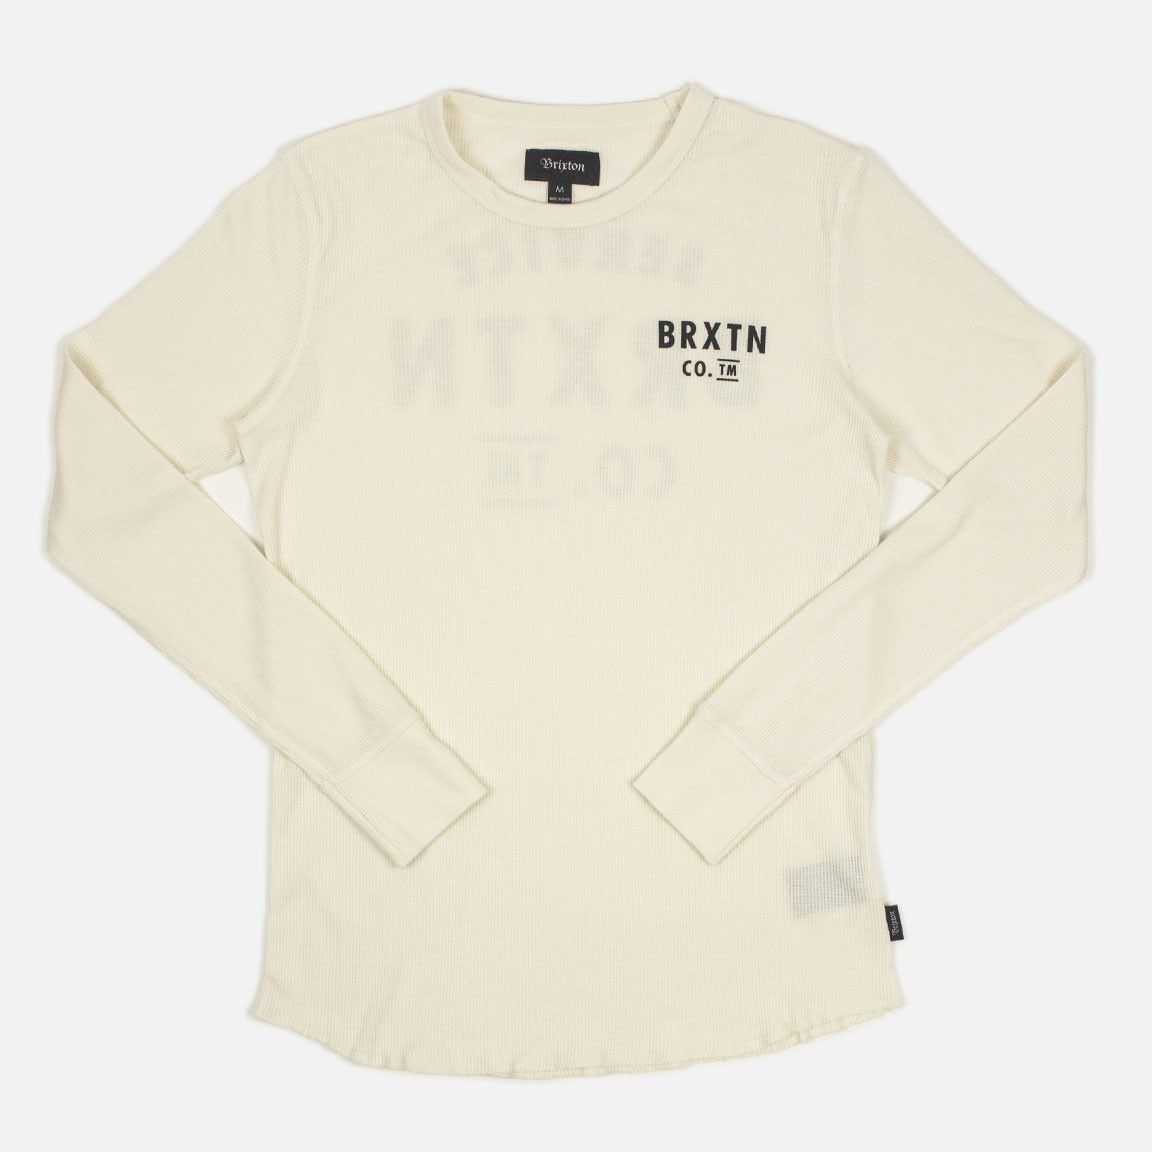 032cef4b322e Brixton Eaton Long Sleeve Thermal T Shirt - Cream